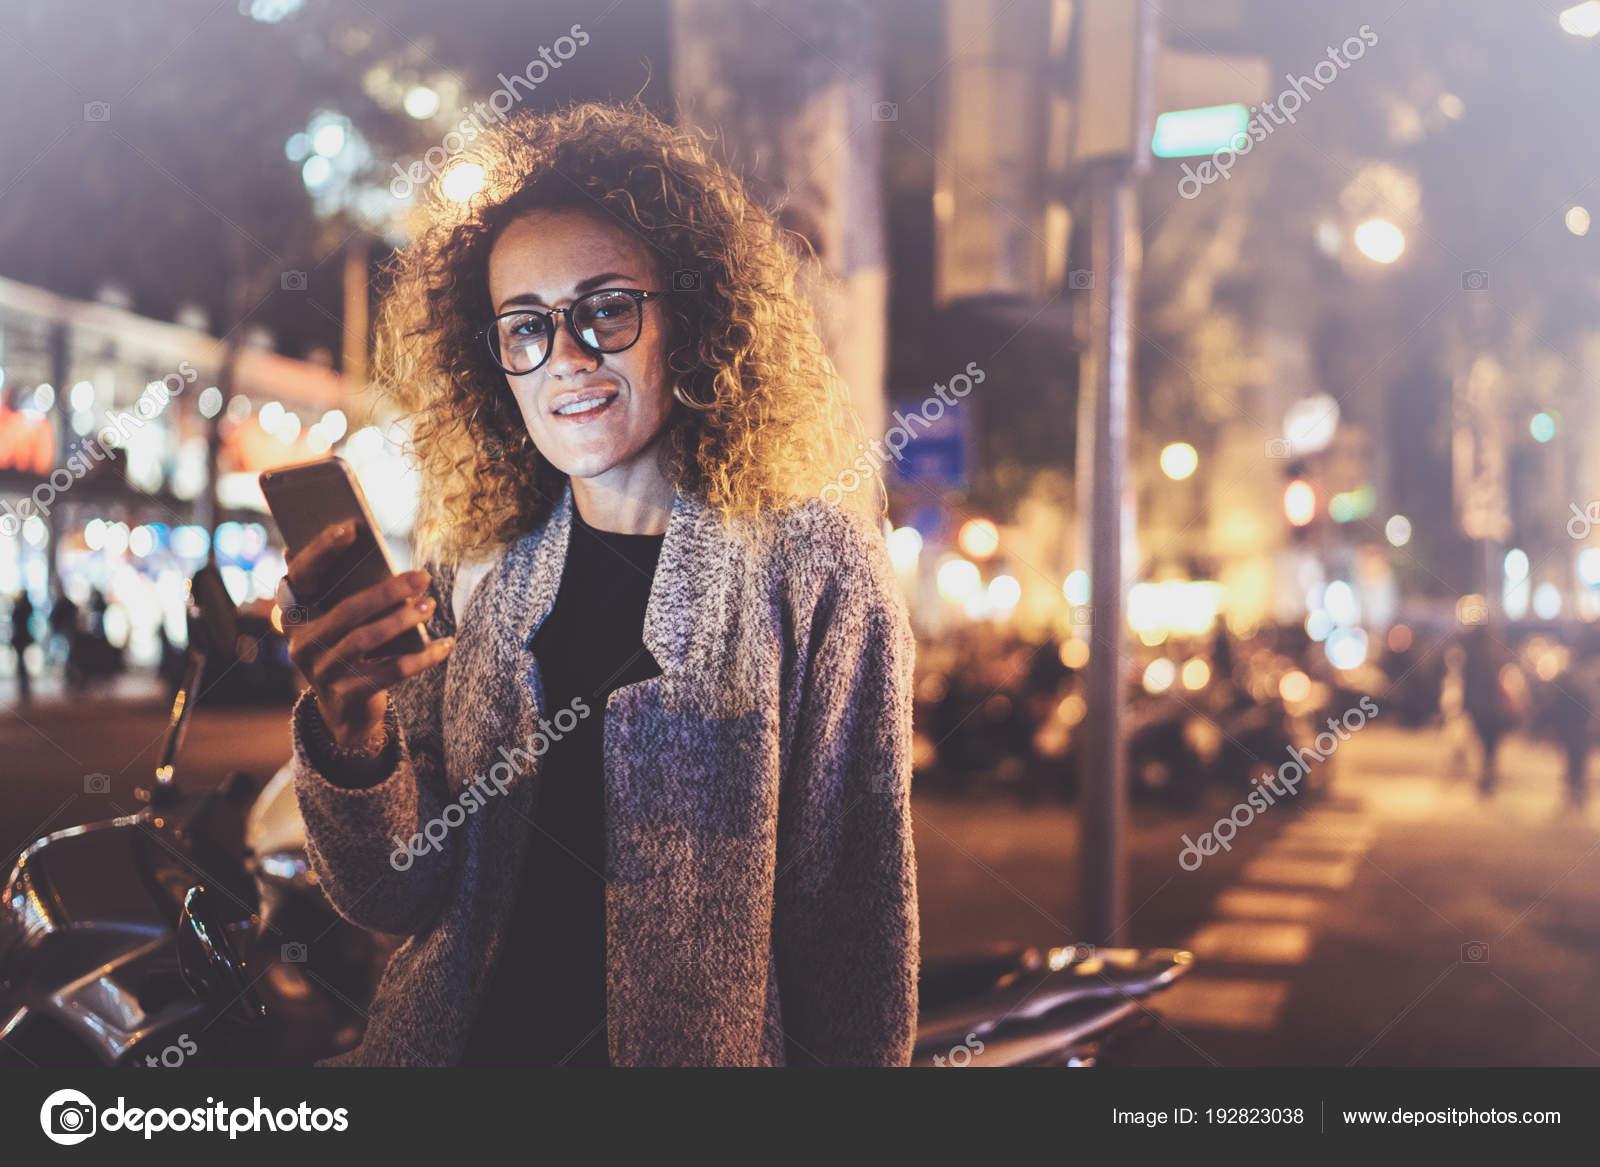 c49ebd5ebded26 Mooi meisje hipster bril hand in hand slimme telefoon